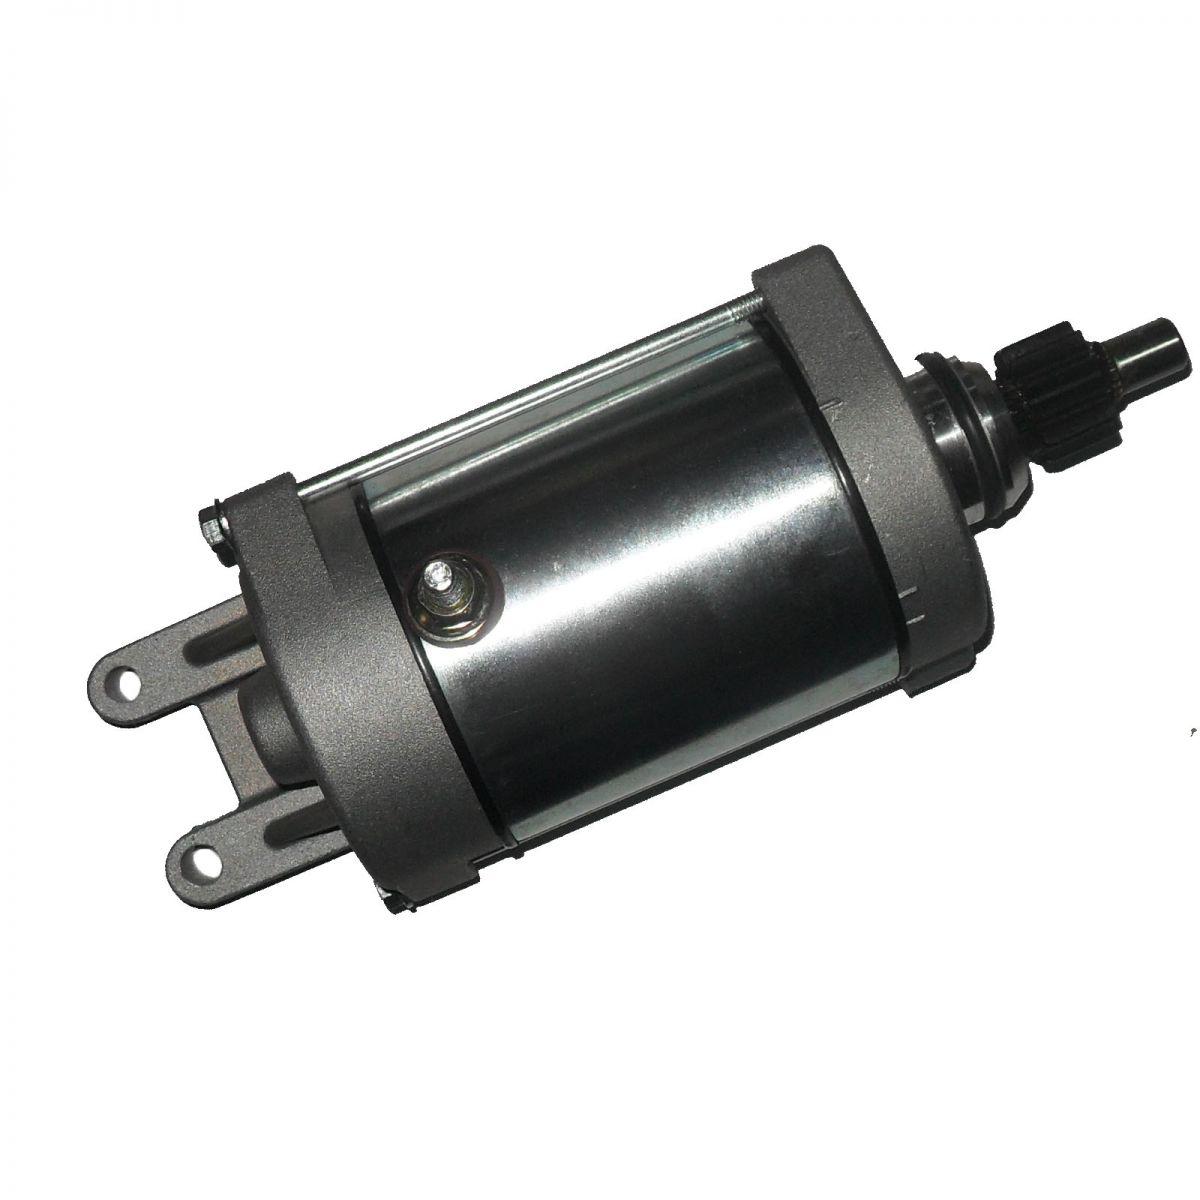 Motor de Partida Yamaha XT 600 / XT 660 / Tenere 90 em Diante (magnetron)